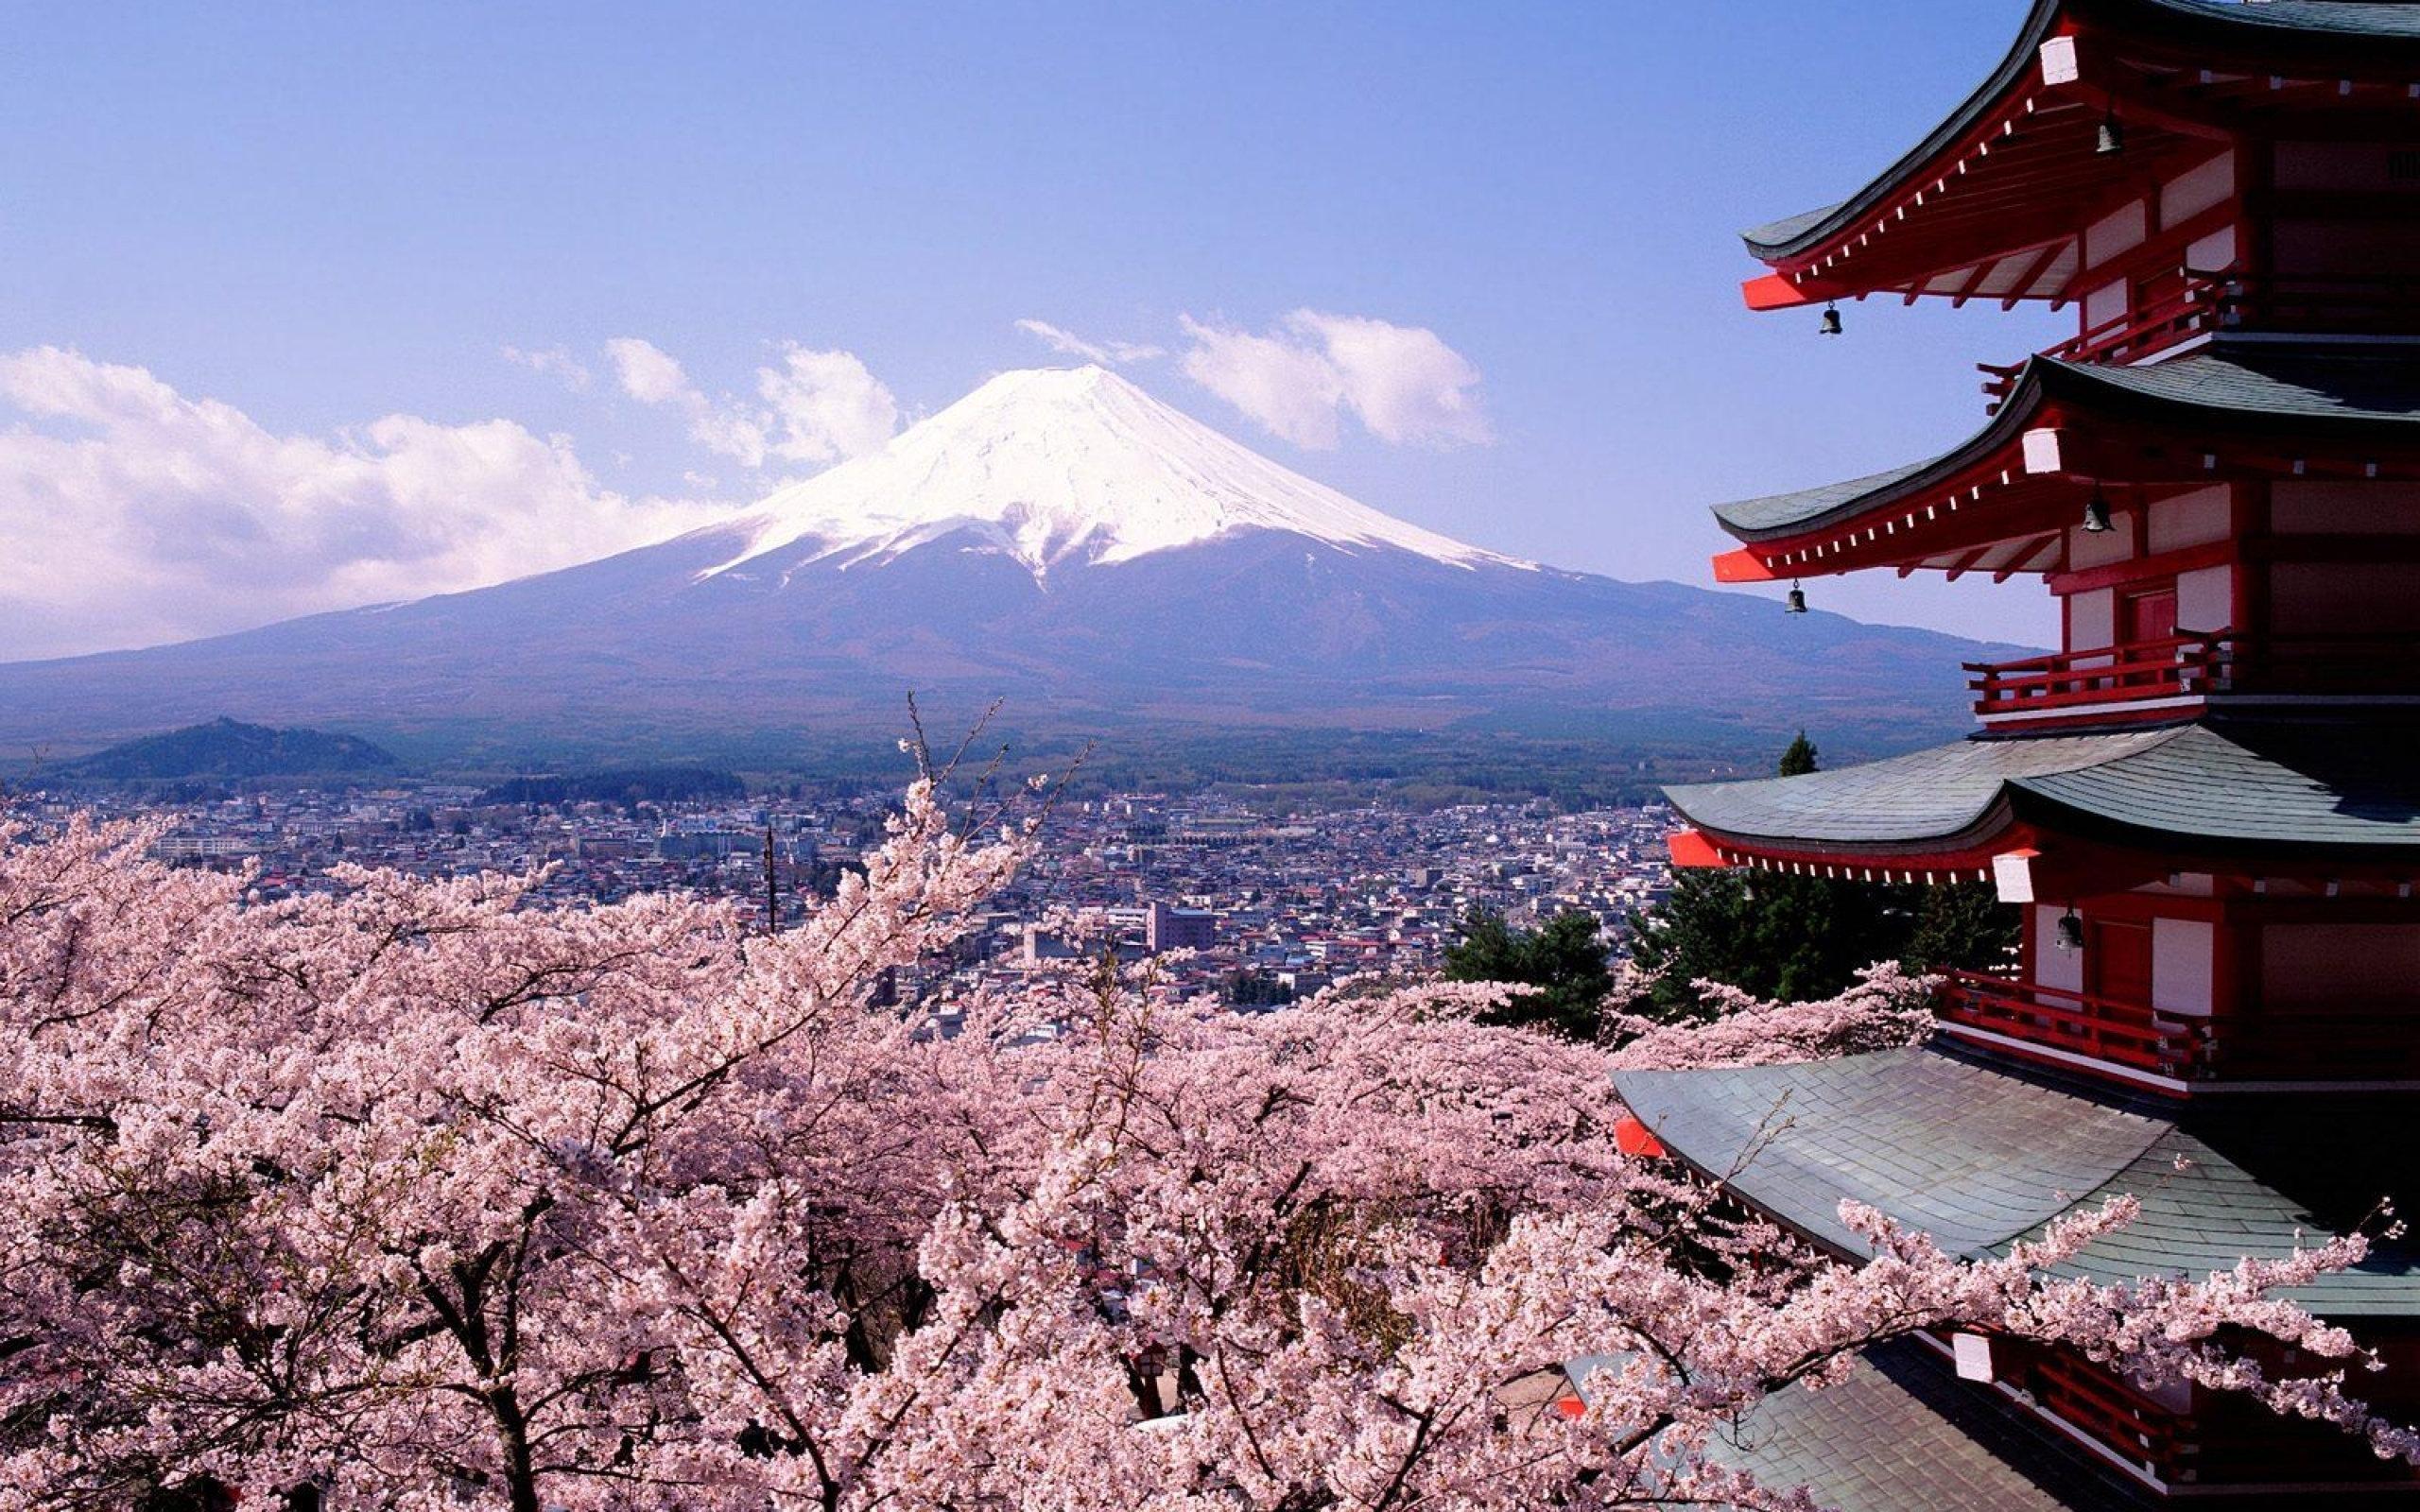 cherry blossoms and mount fuji japan wallpaper 2560x1600 987 wallpaperup. Black Bedroom Furniture Sets. Home Design Ideas